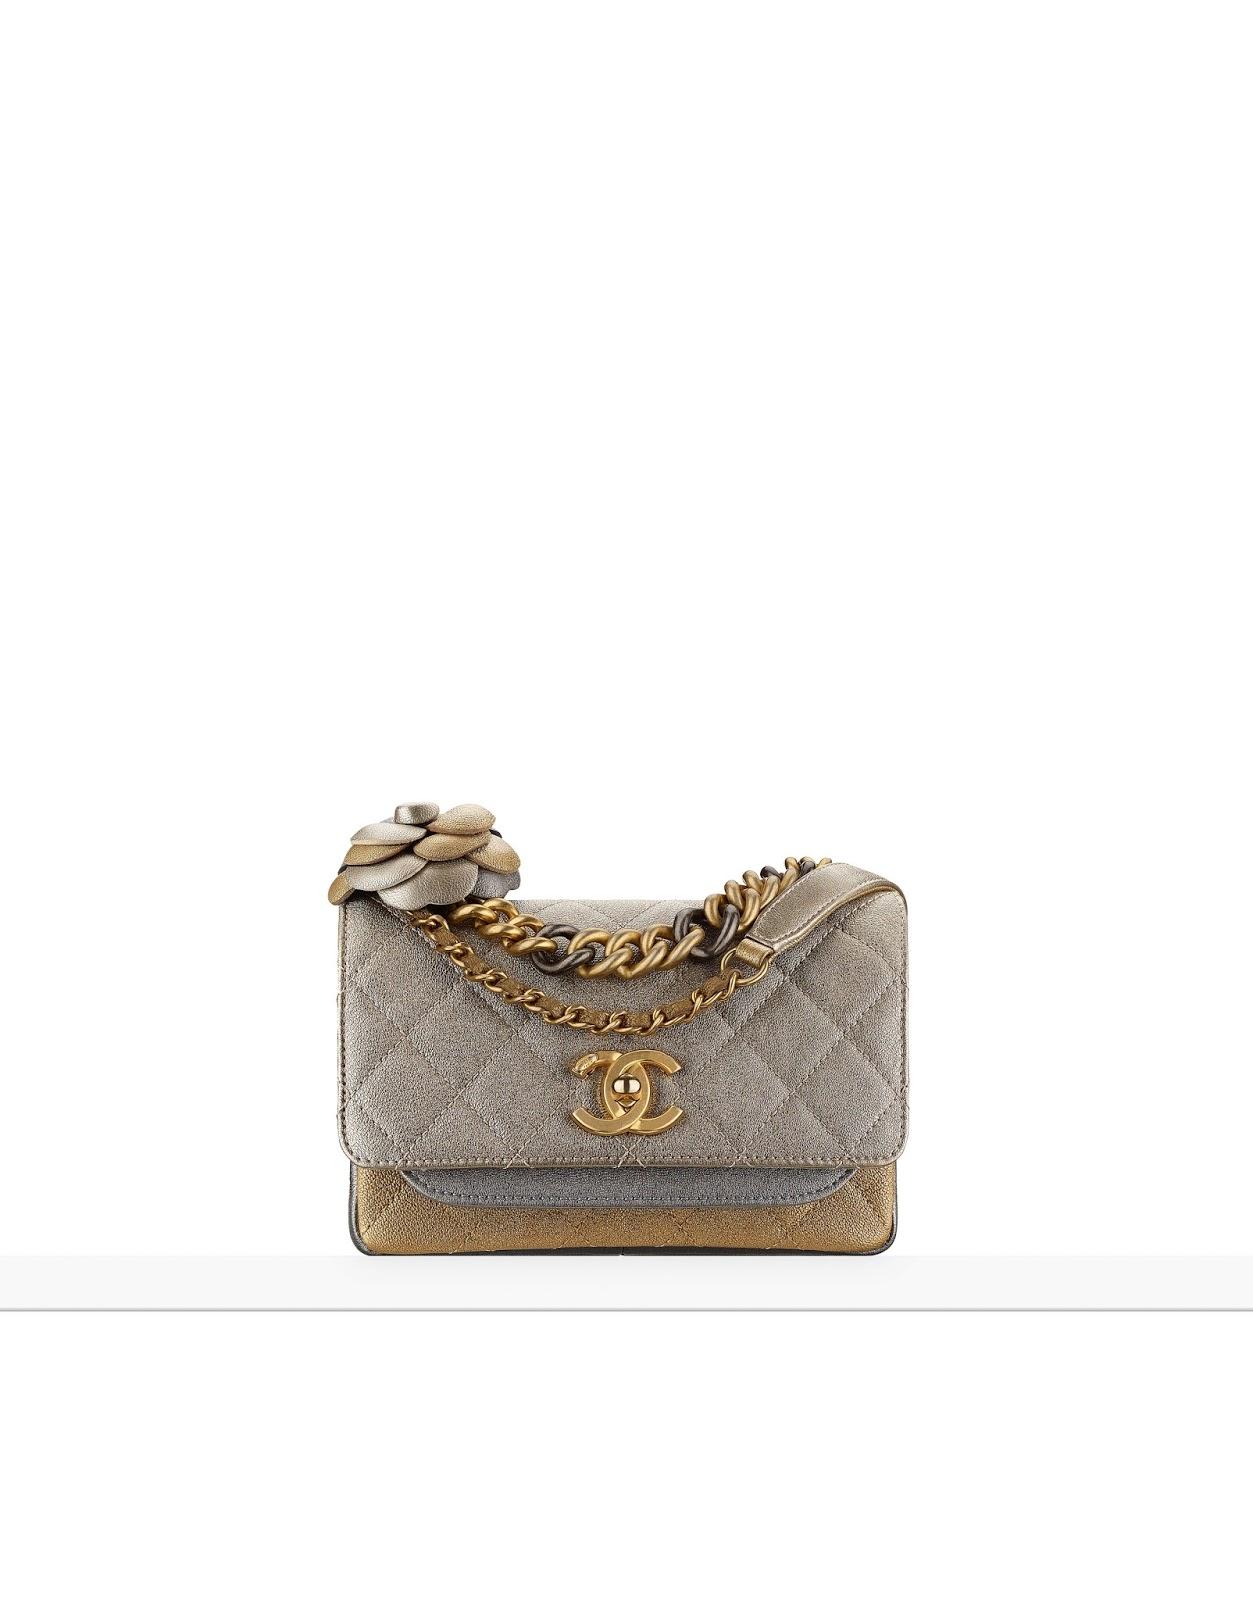 Chanel's Metallic Lambskin Flap With Camellia